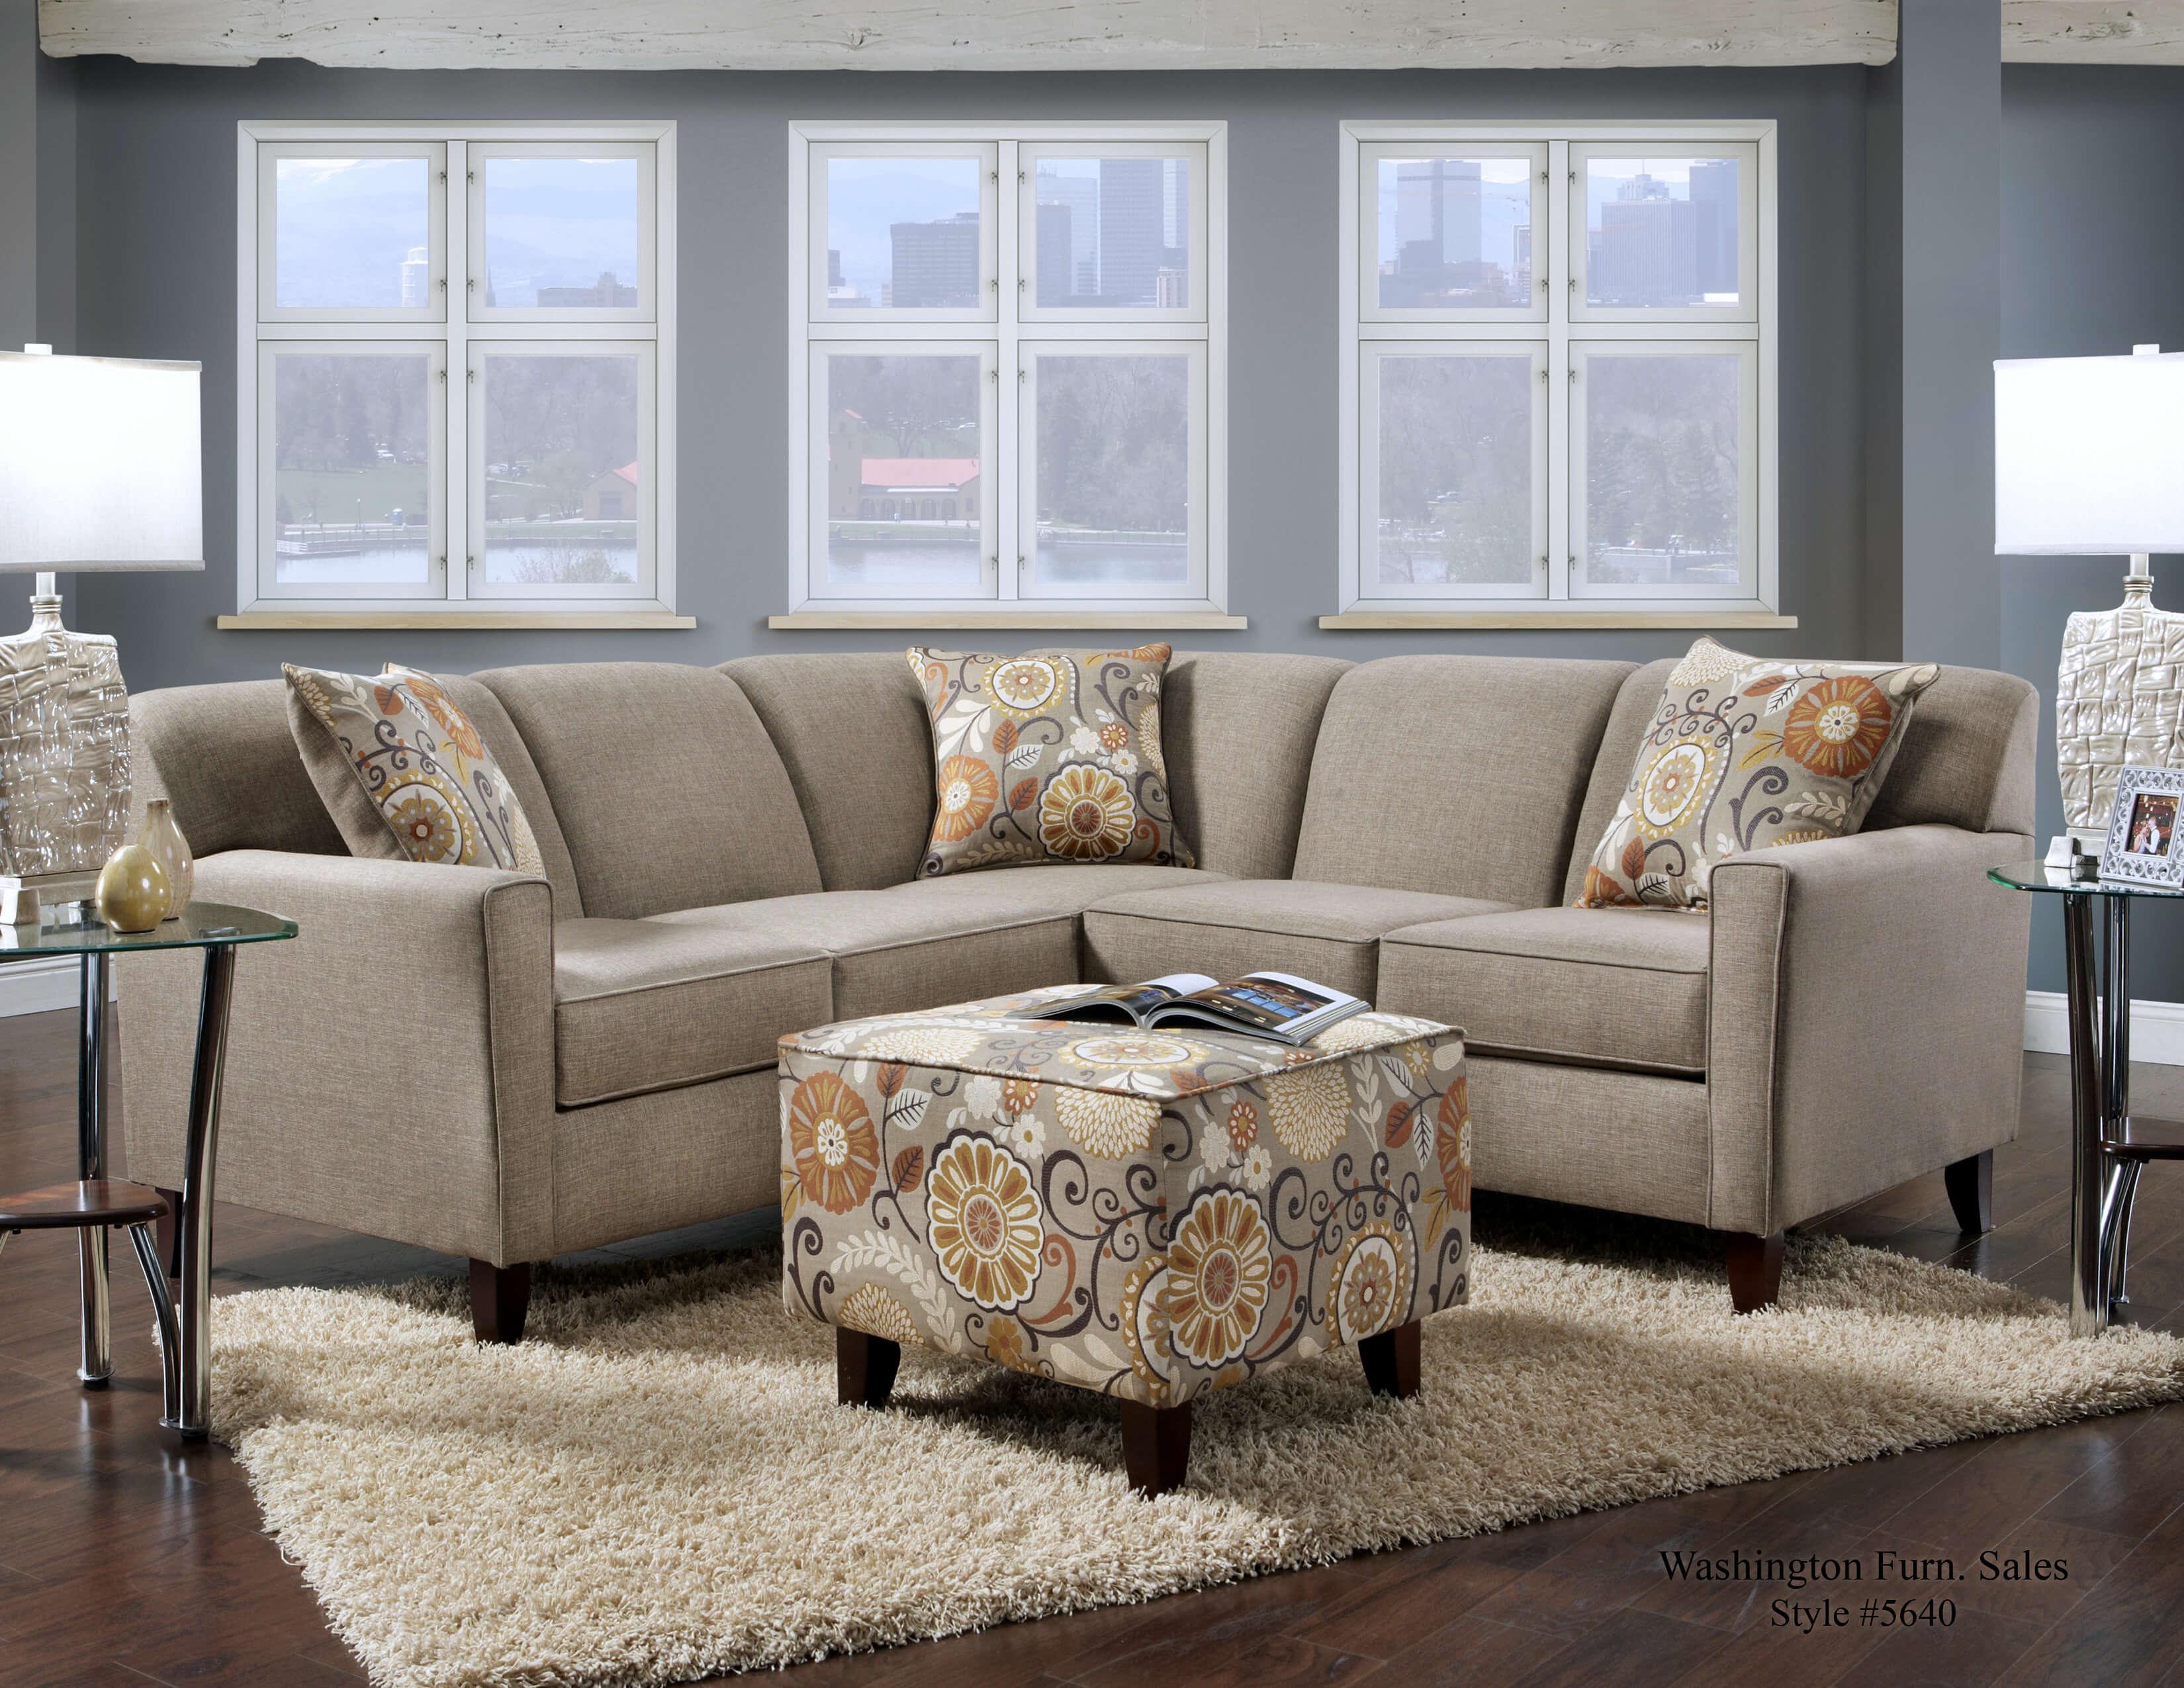 Grande Badger Sectional Sectional Sofa Sets